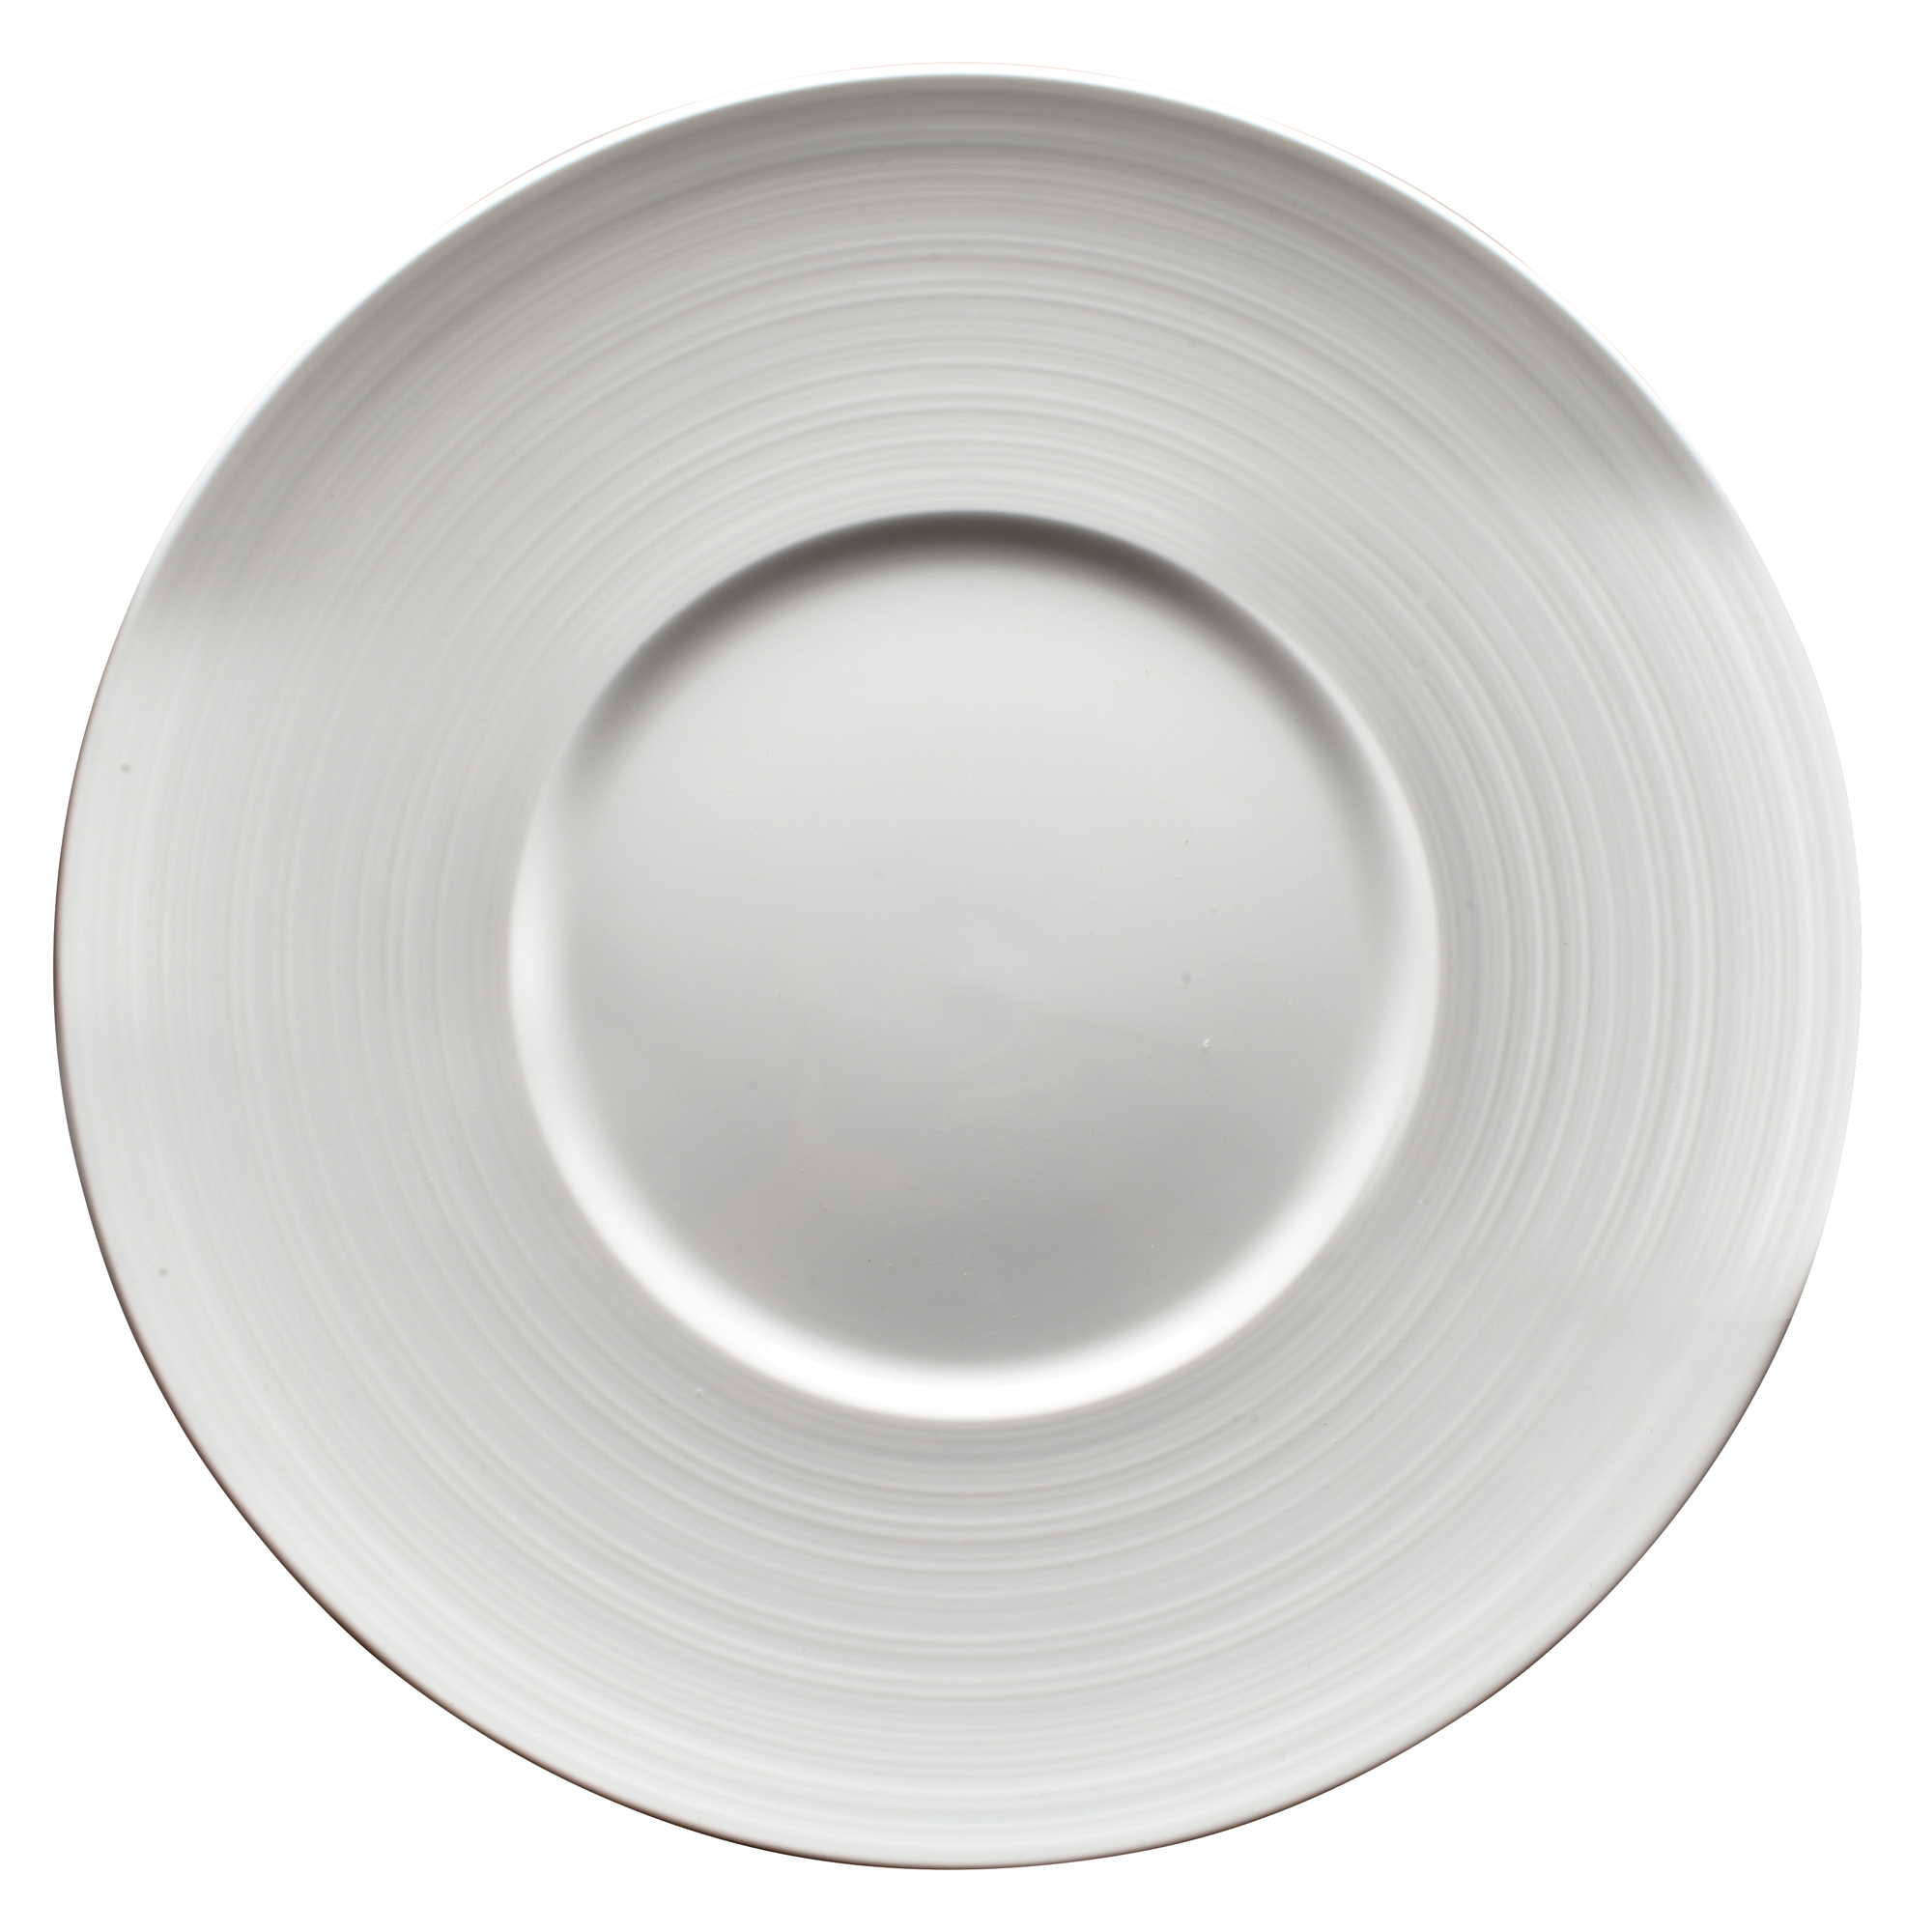 Winco WDP022-109 plate, china